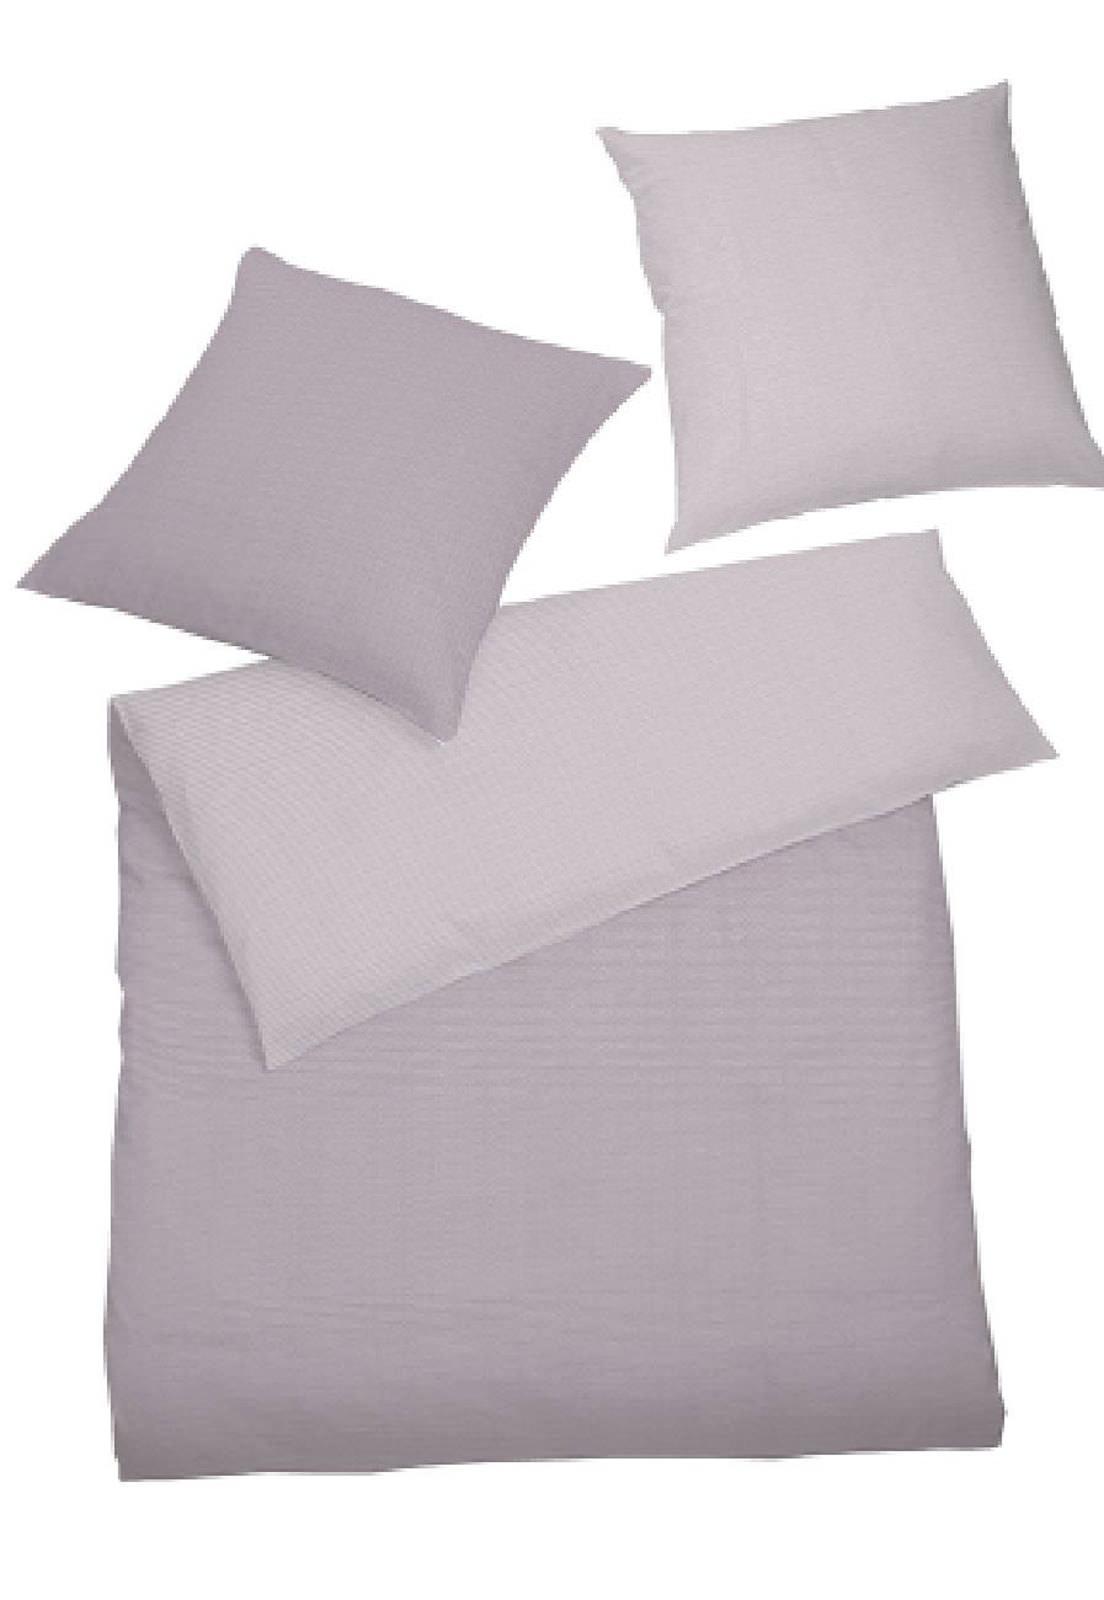 schlafgut casual cotton bettw sche online entdecken knuffmann ihr m belhaus. Black Bedroom Furniture Sets. Home Design Ideas